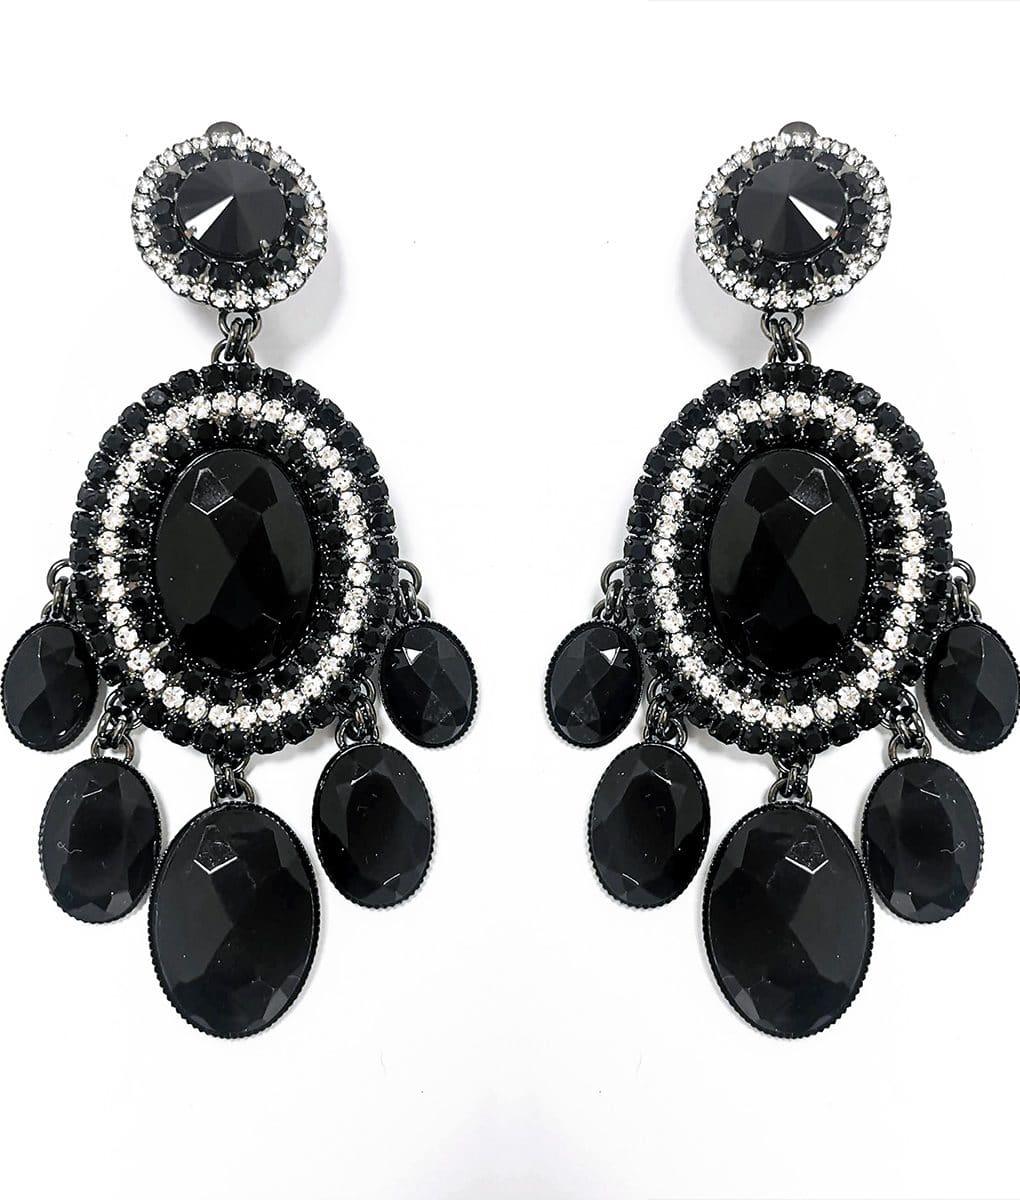 Large-Black-and-crystal-clip-on-earrings-Alila-Irish